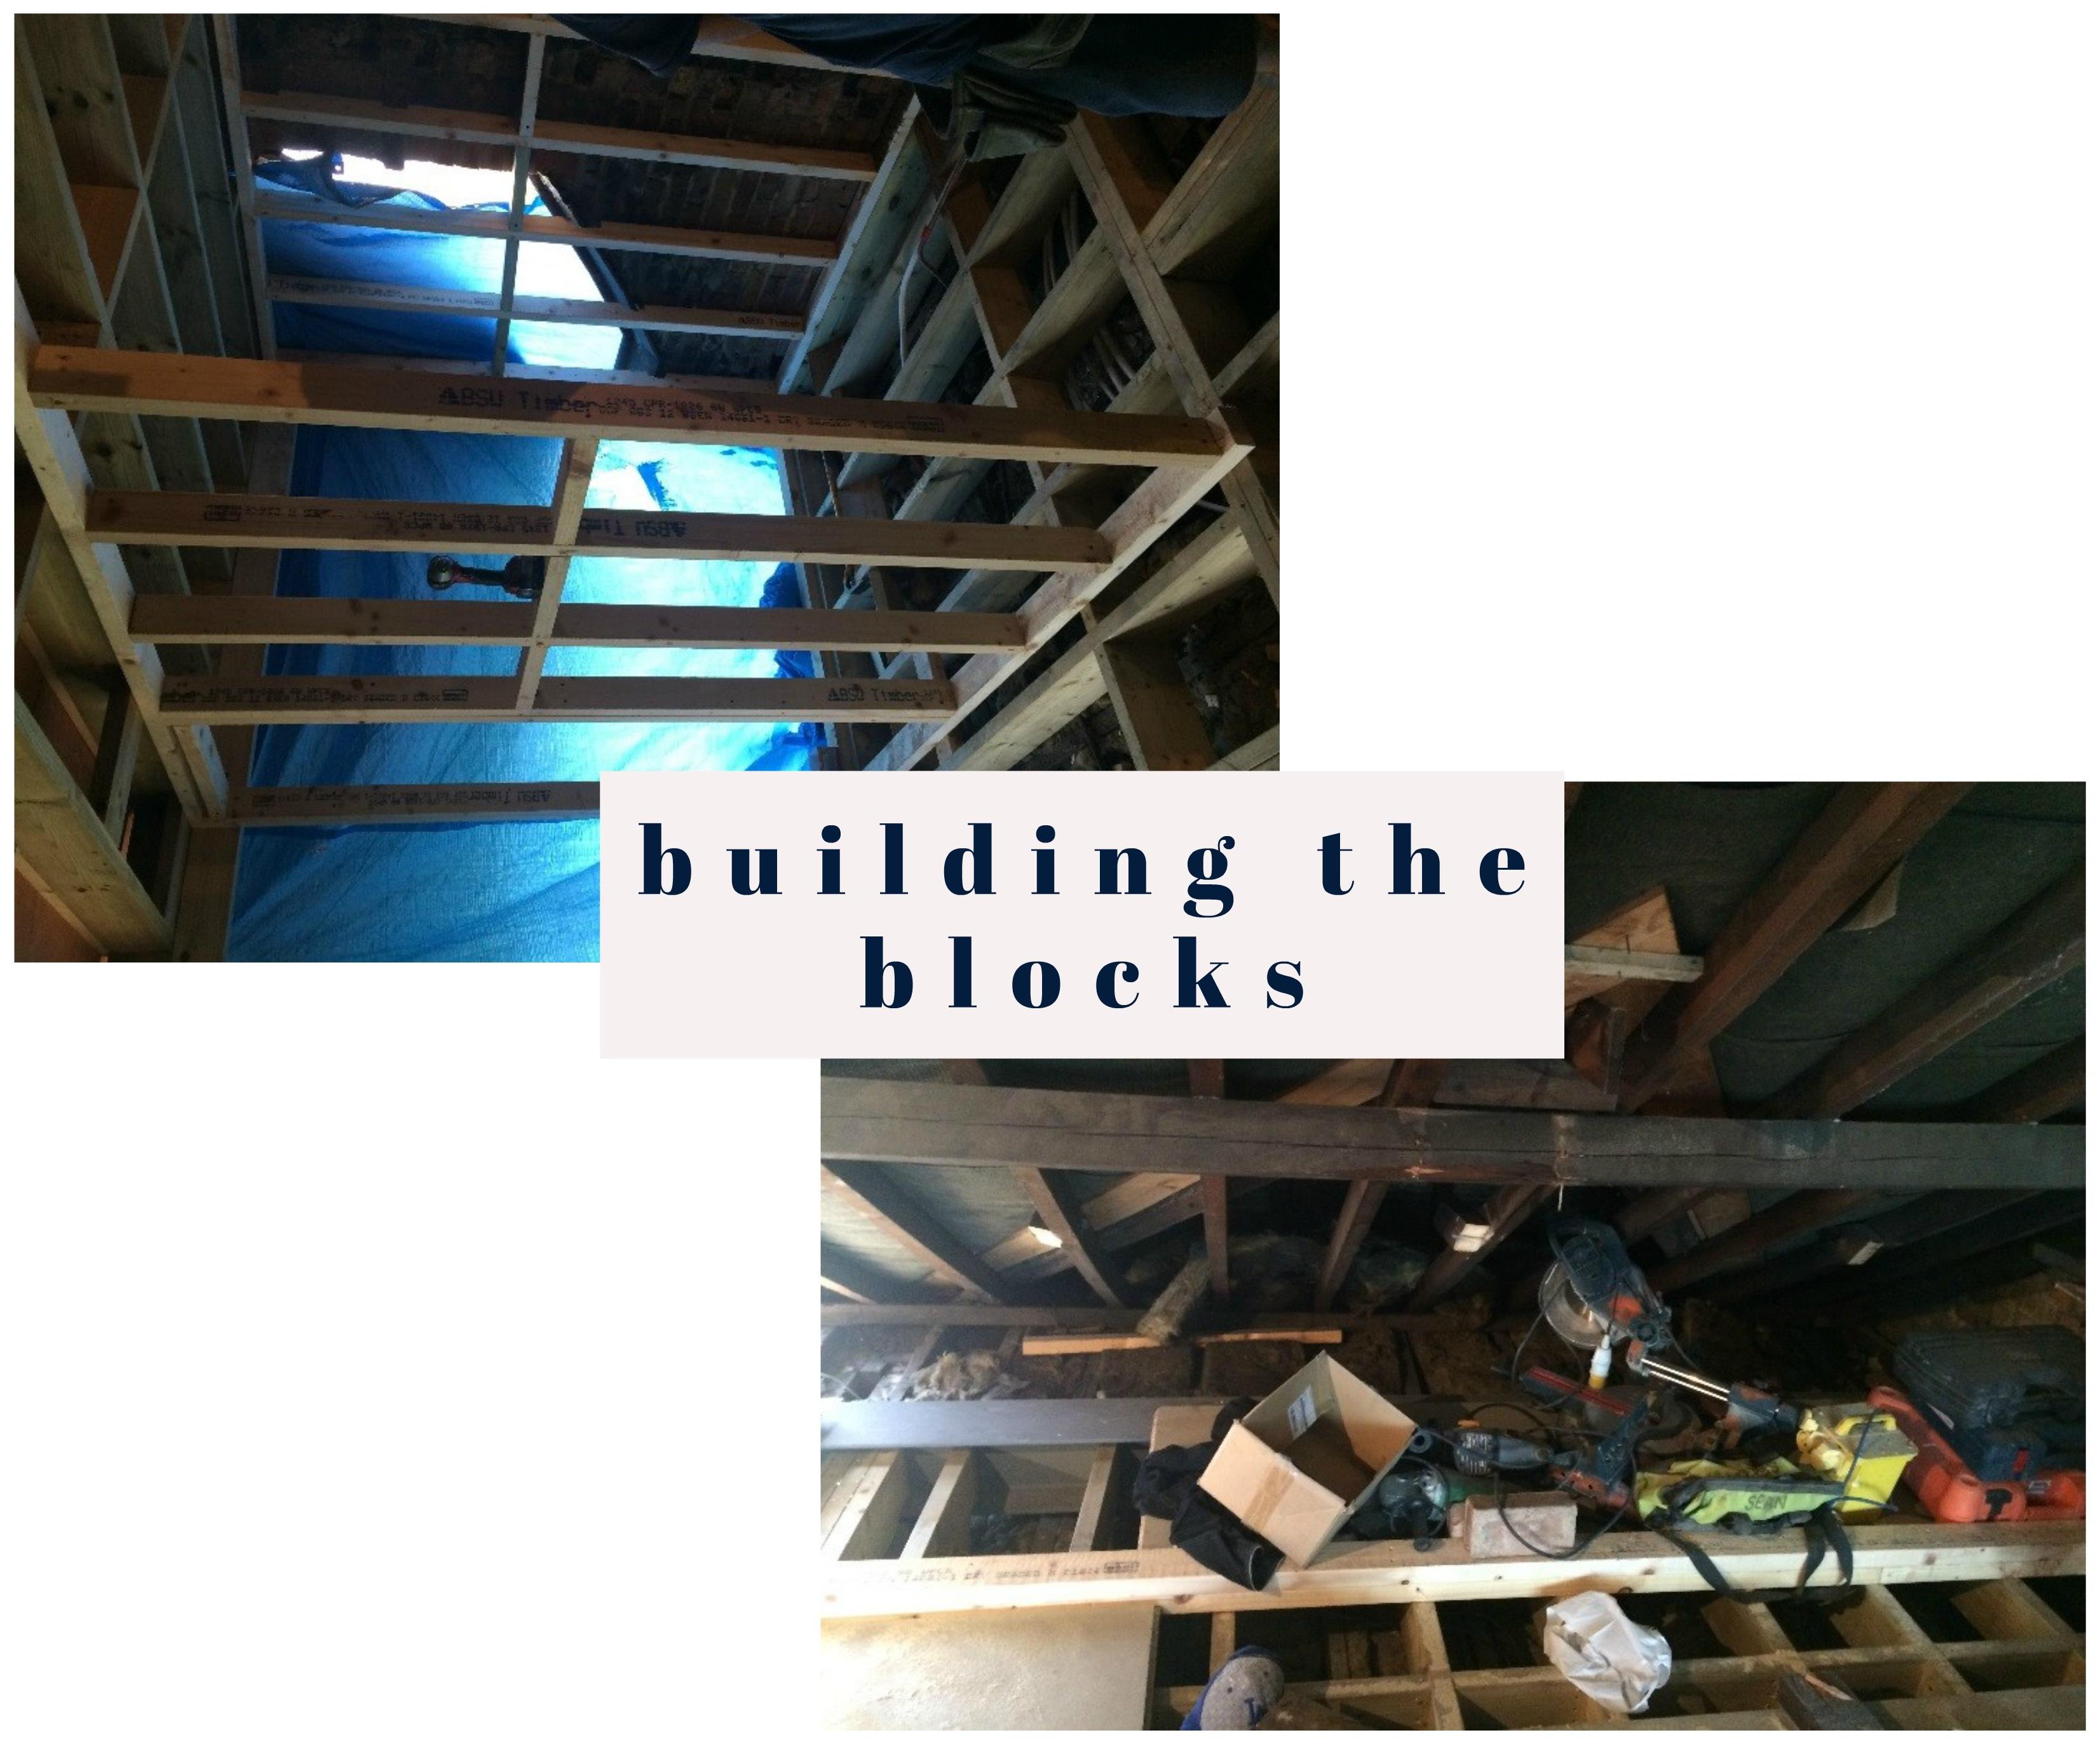 building the blocks